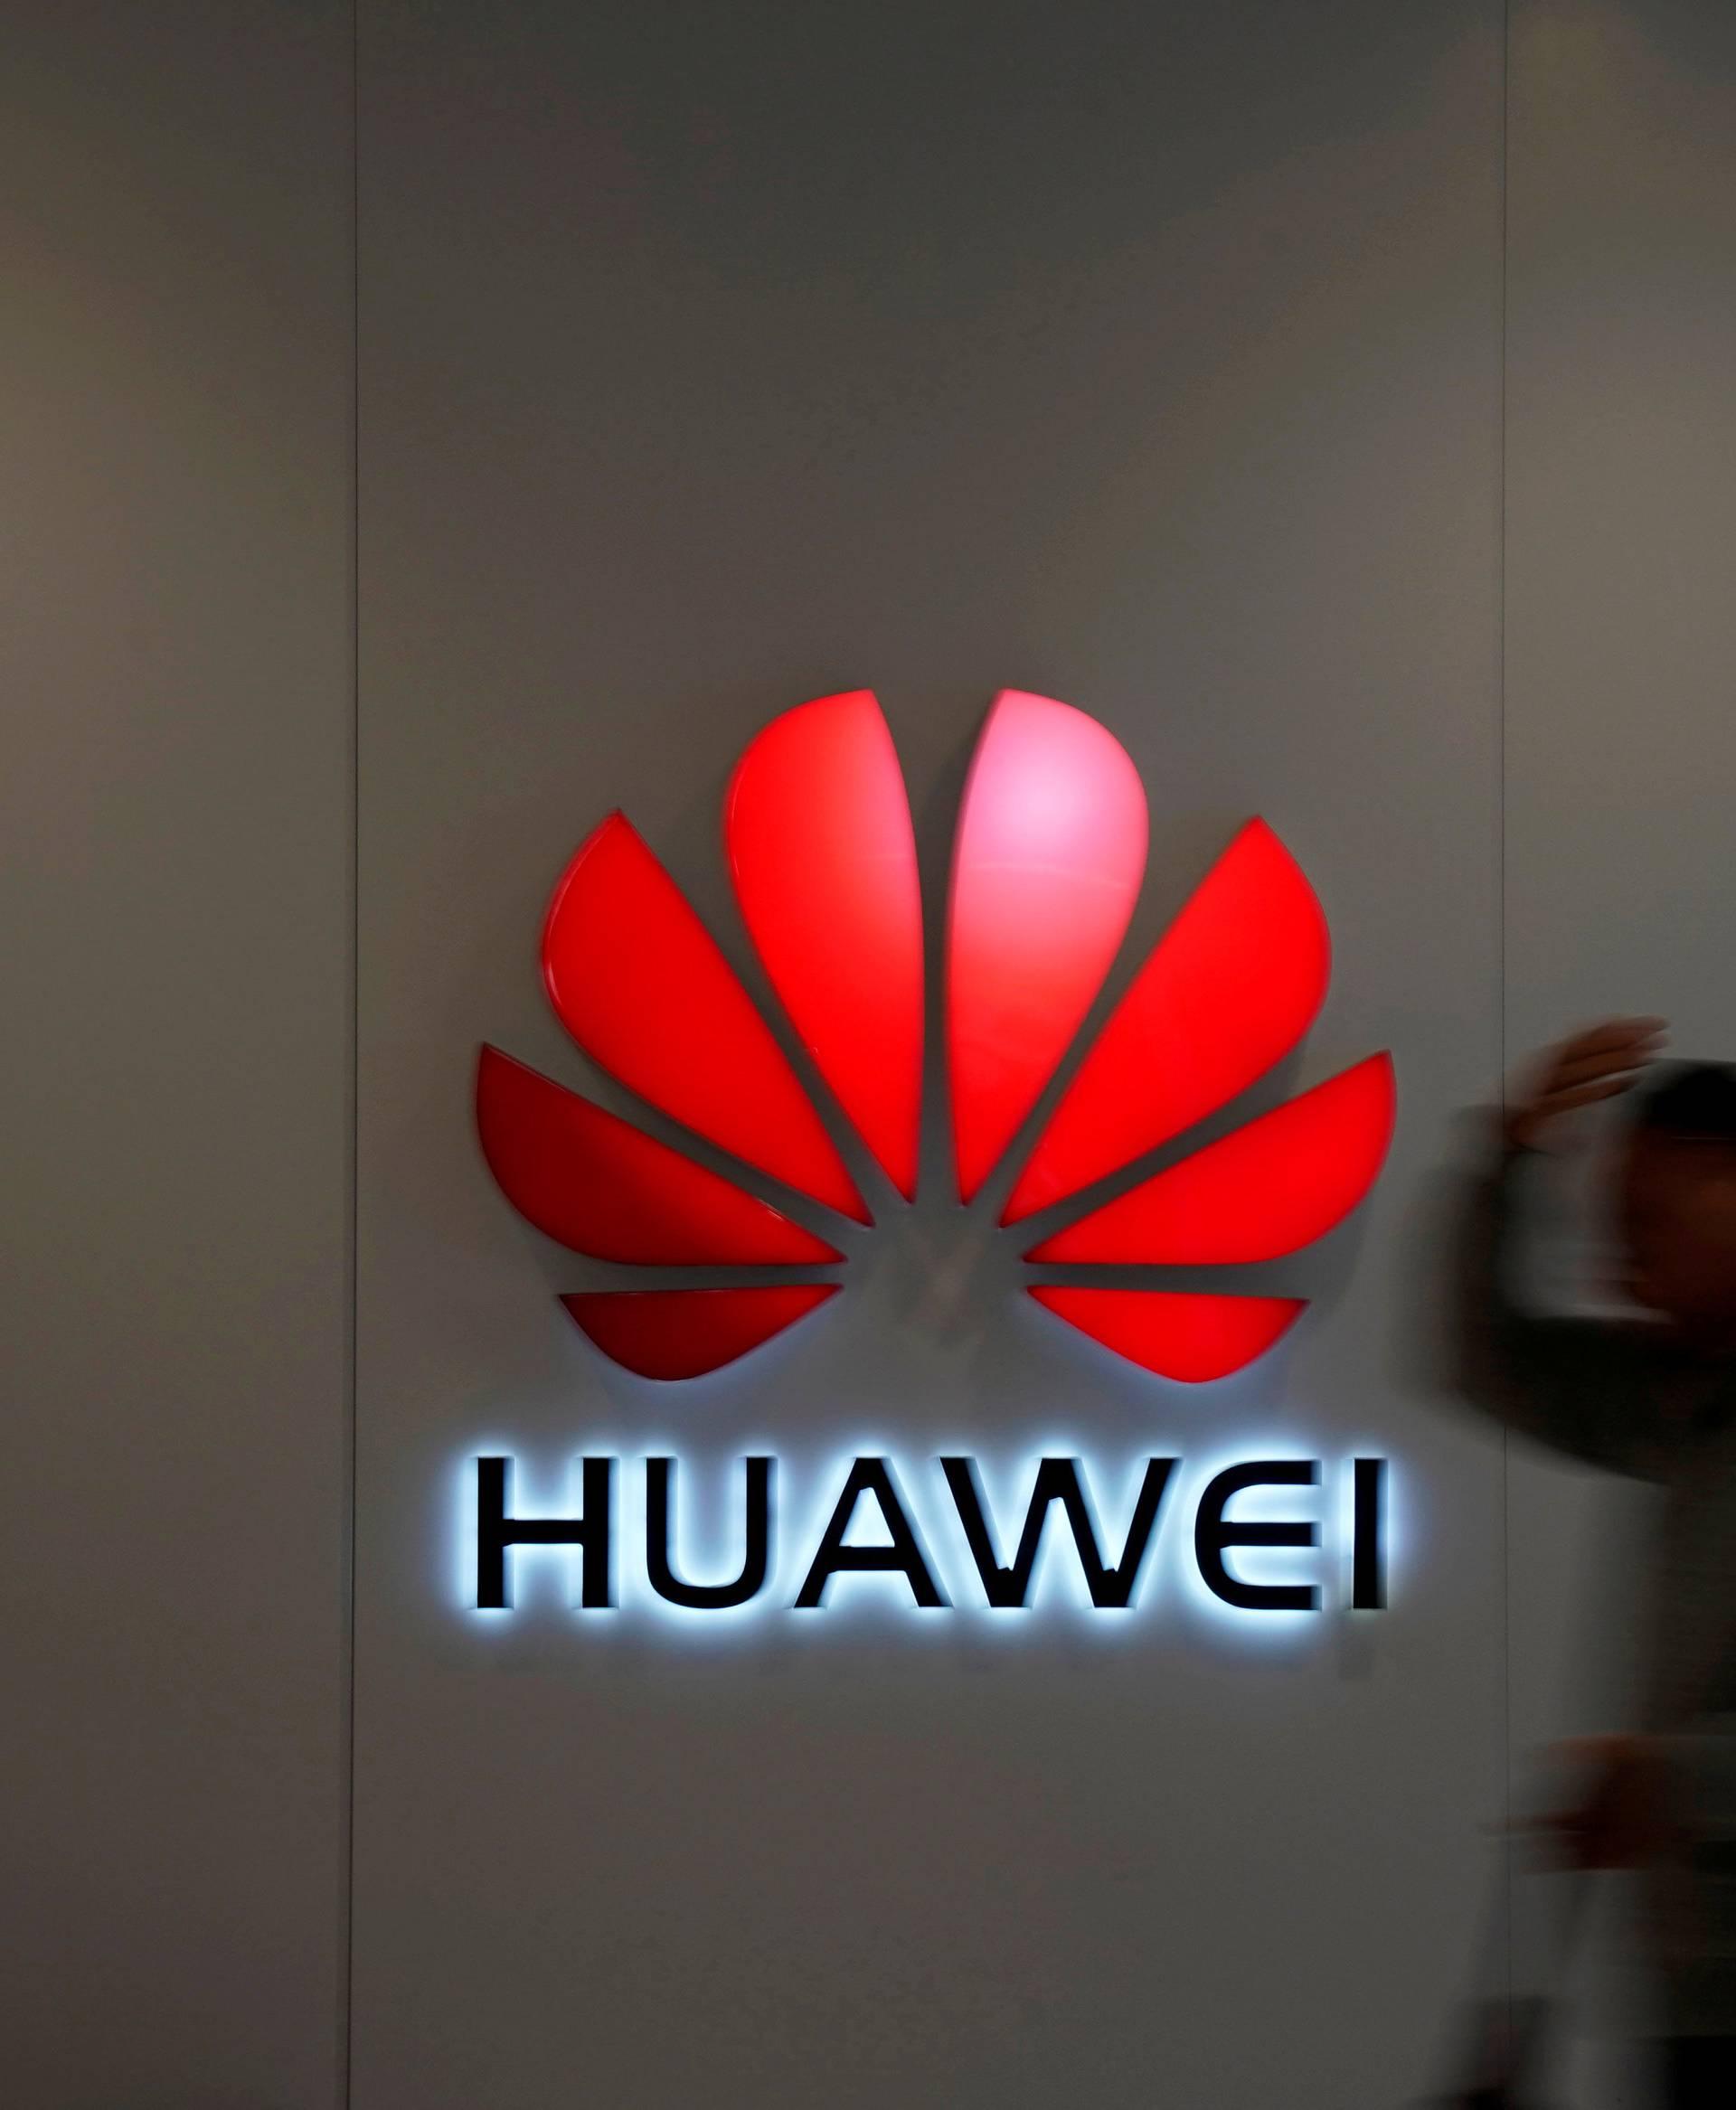 FILE PHOTO: Man walks by a Huawei logo at a shopping mall in Shanghai